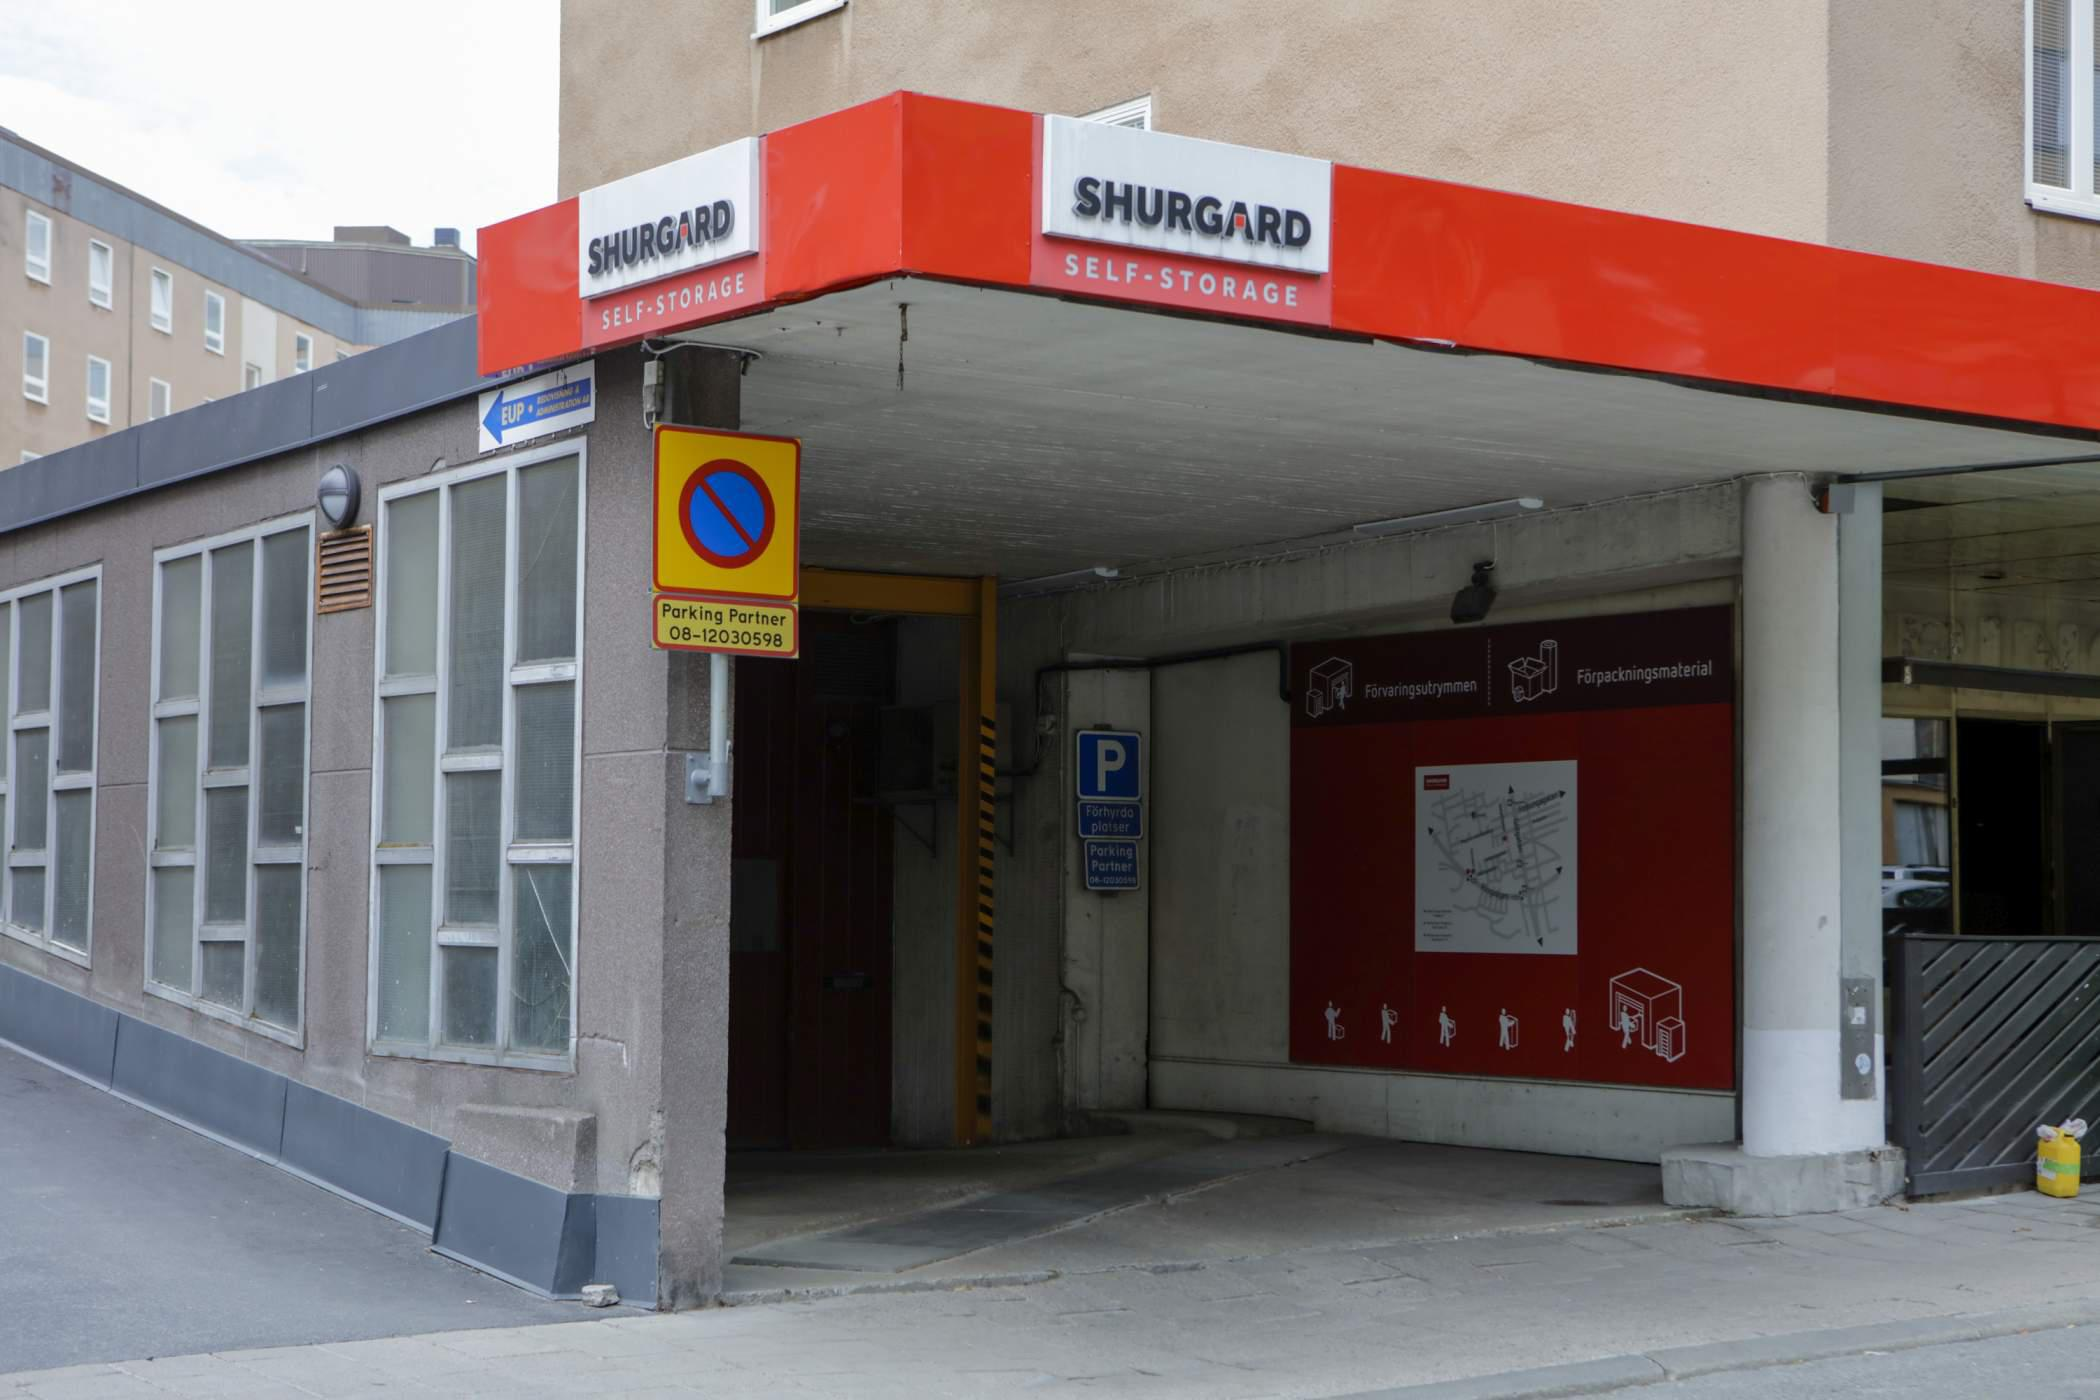 Shurgard Self-Storage Stockholm Södermalm